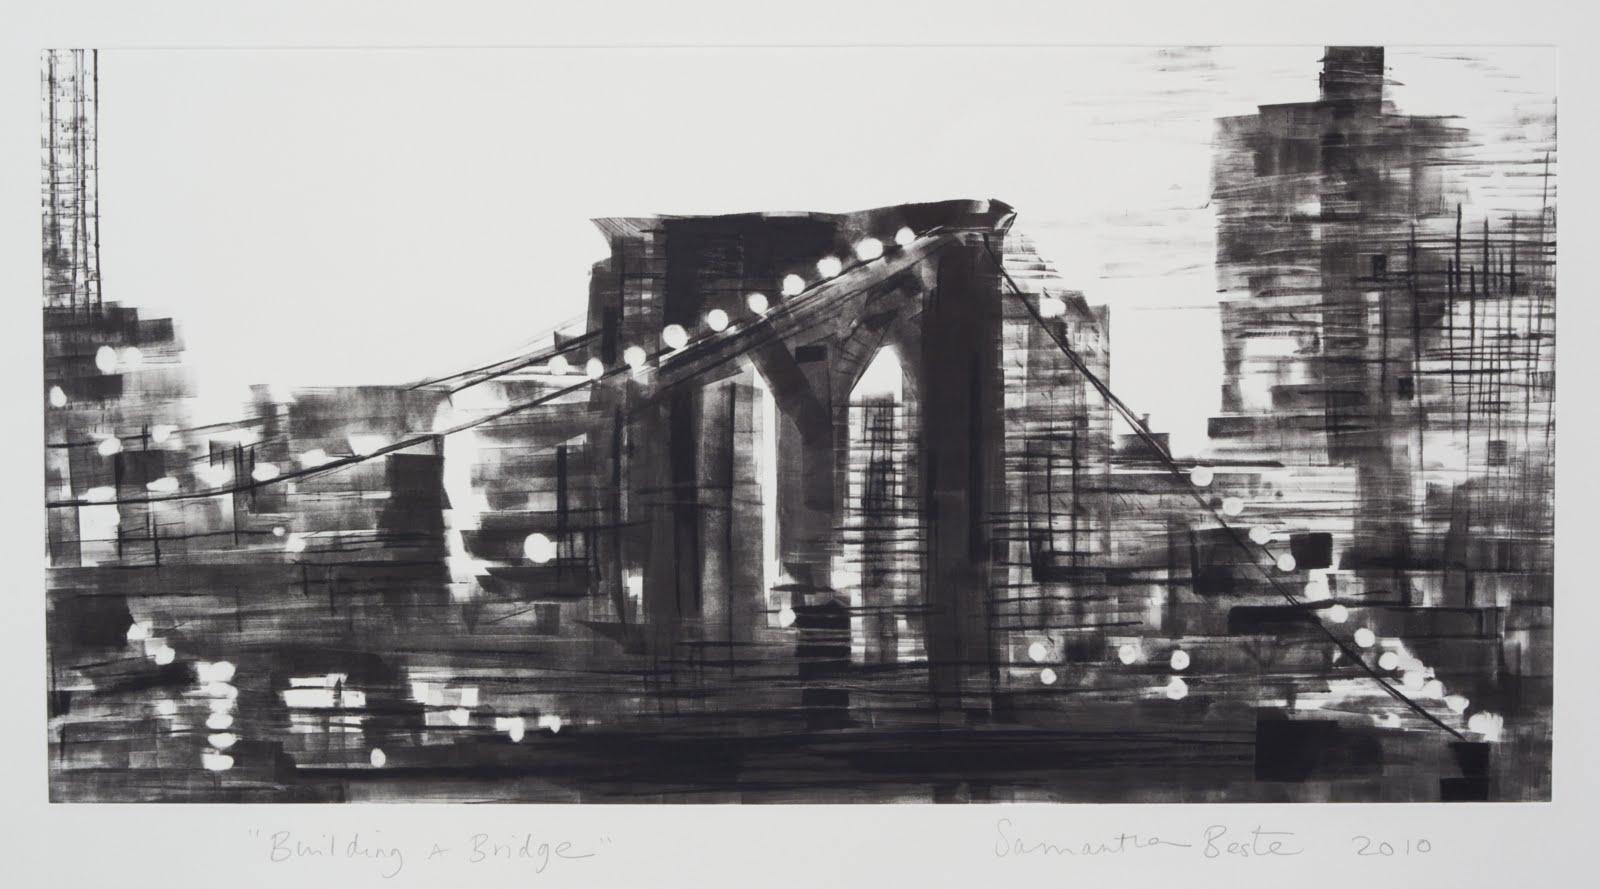 """Building a Bridge"", monotype, 12 x 24 in."